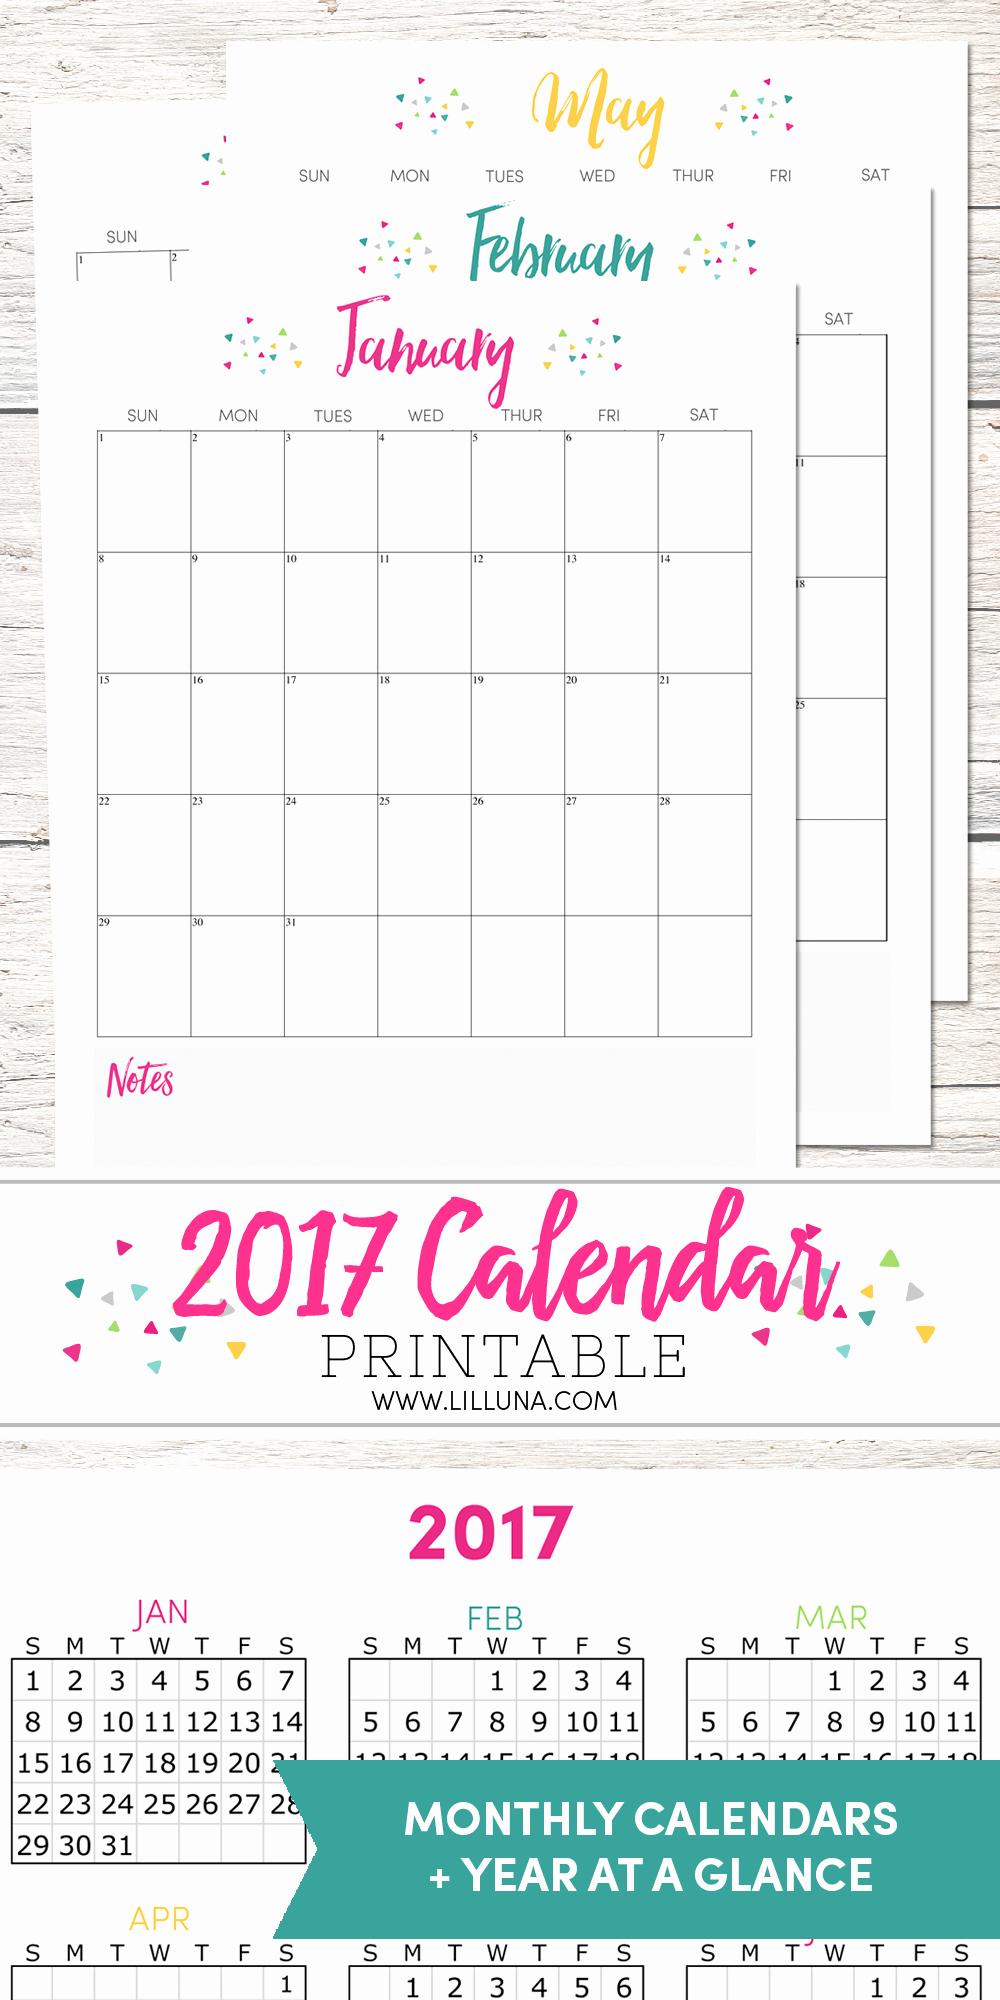 2017 Calendar Template with Notes New Free 2017 Calendar